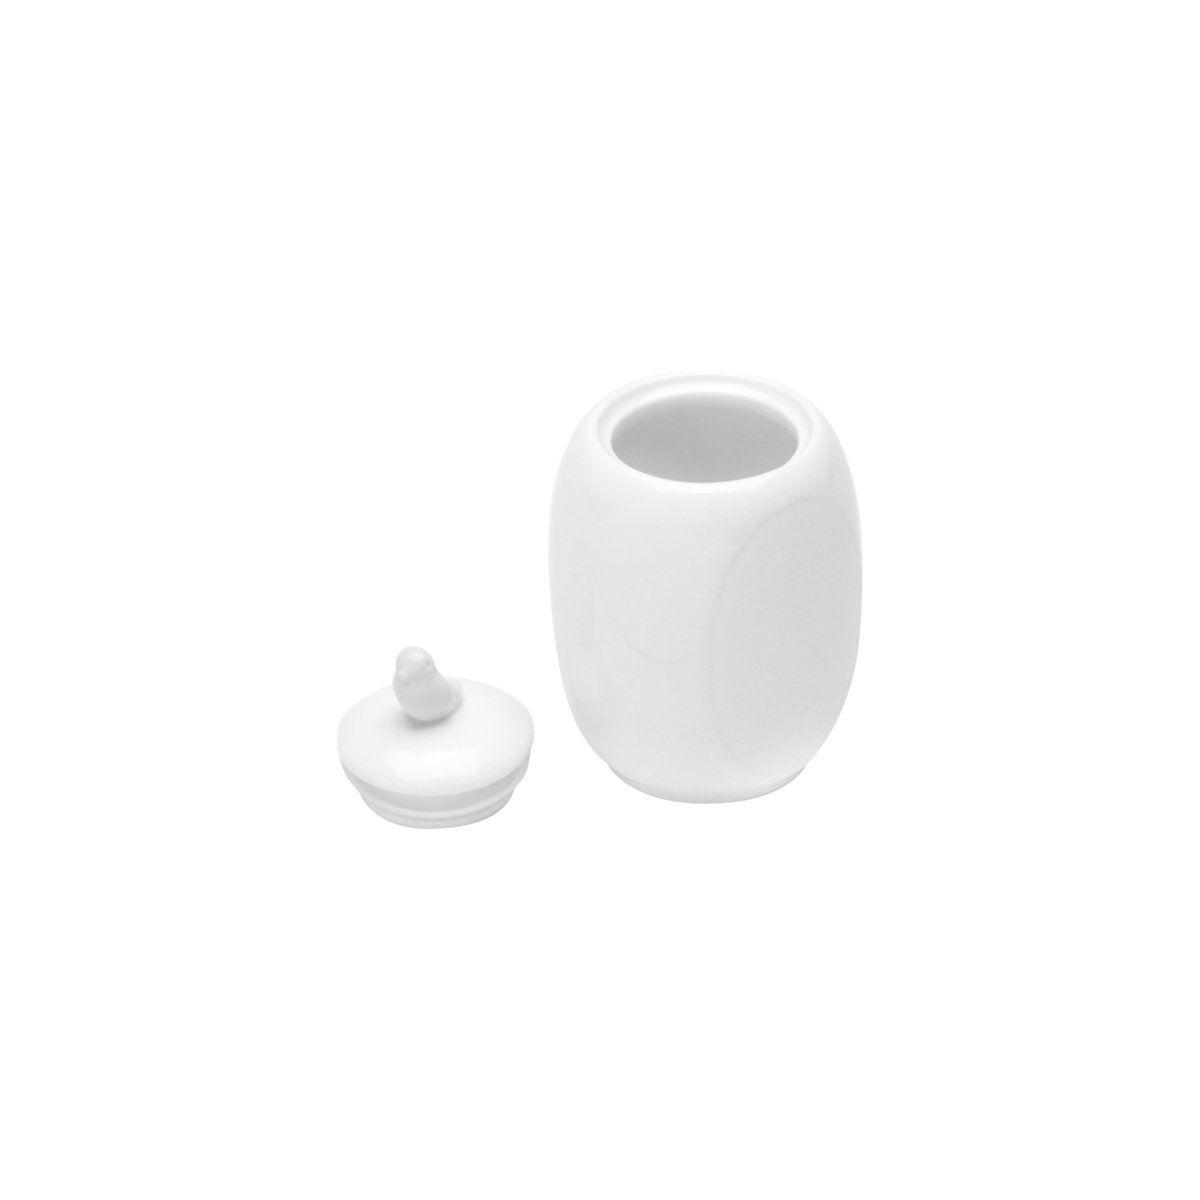 Pote 11 cm de porcelana branca com tampa Birds Wolff - 17296